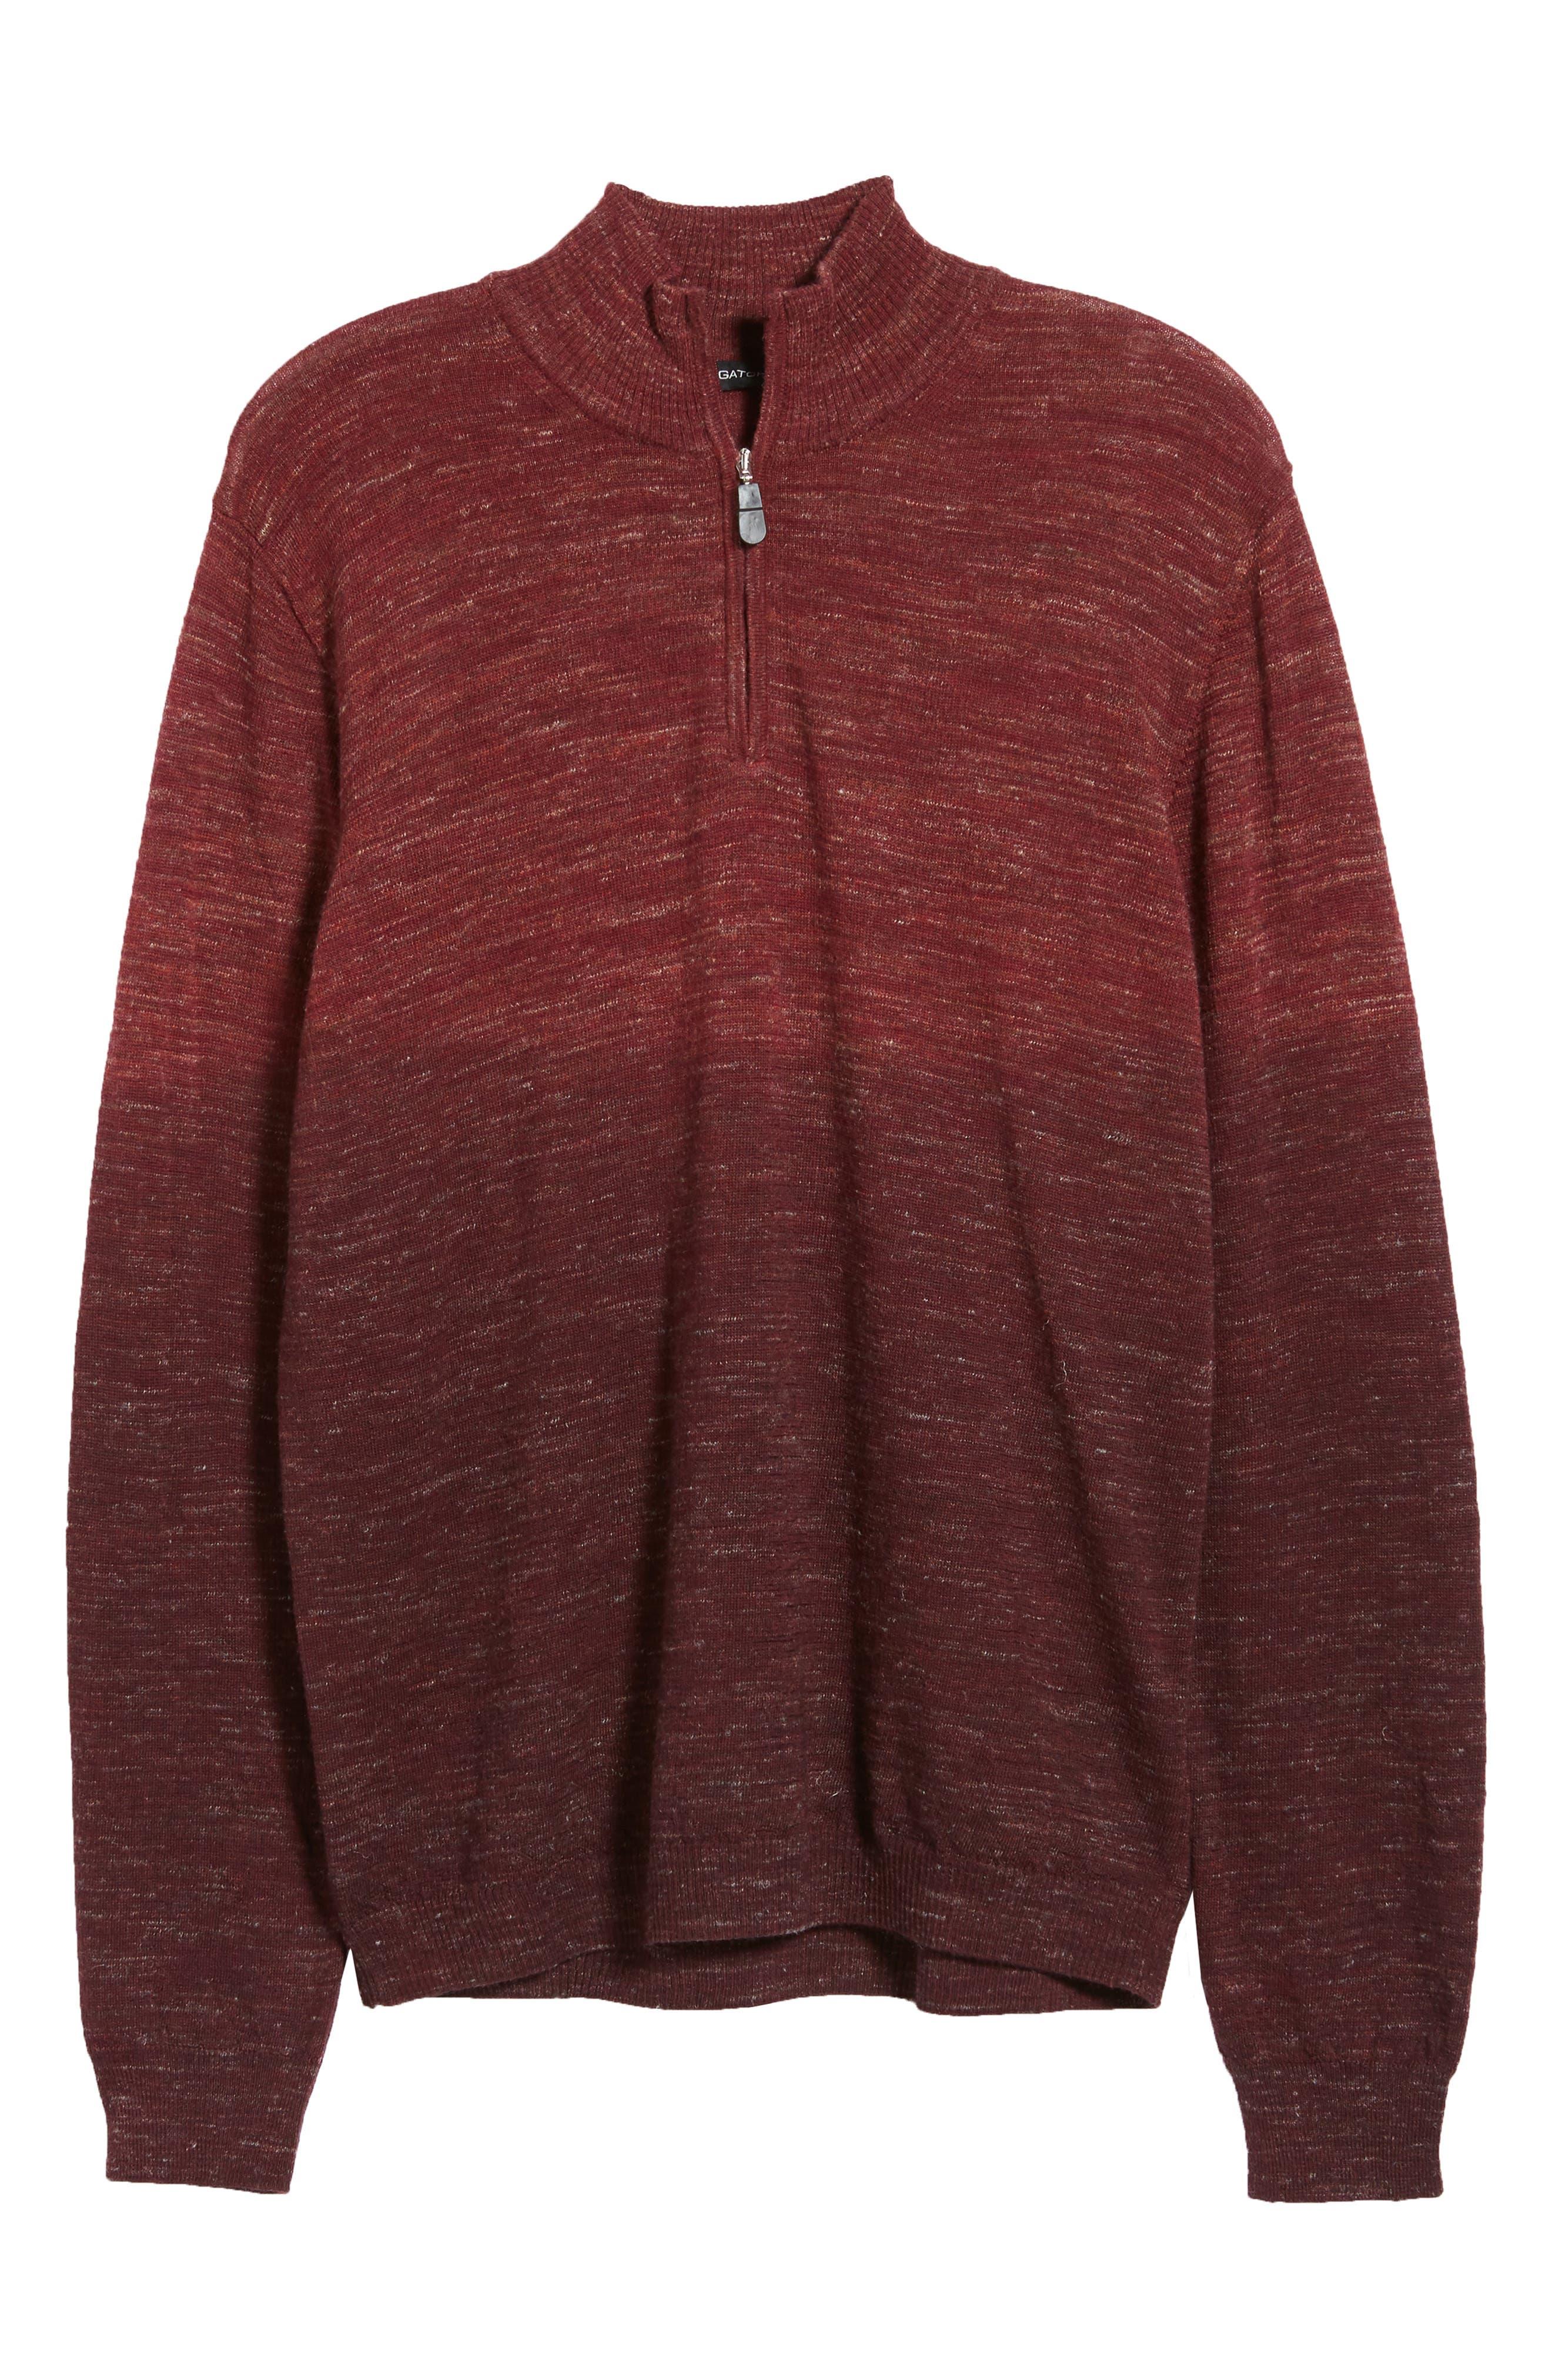 Quarter Zip Pullover,                             Alternate thumbnail 6, color,                             WINE